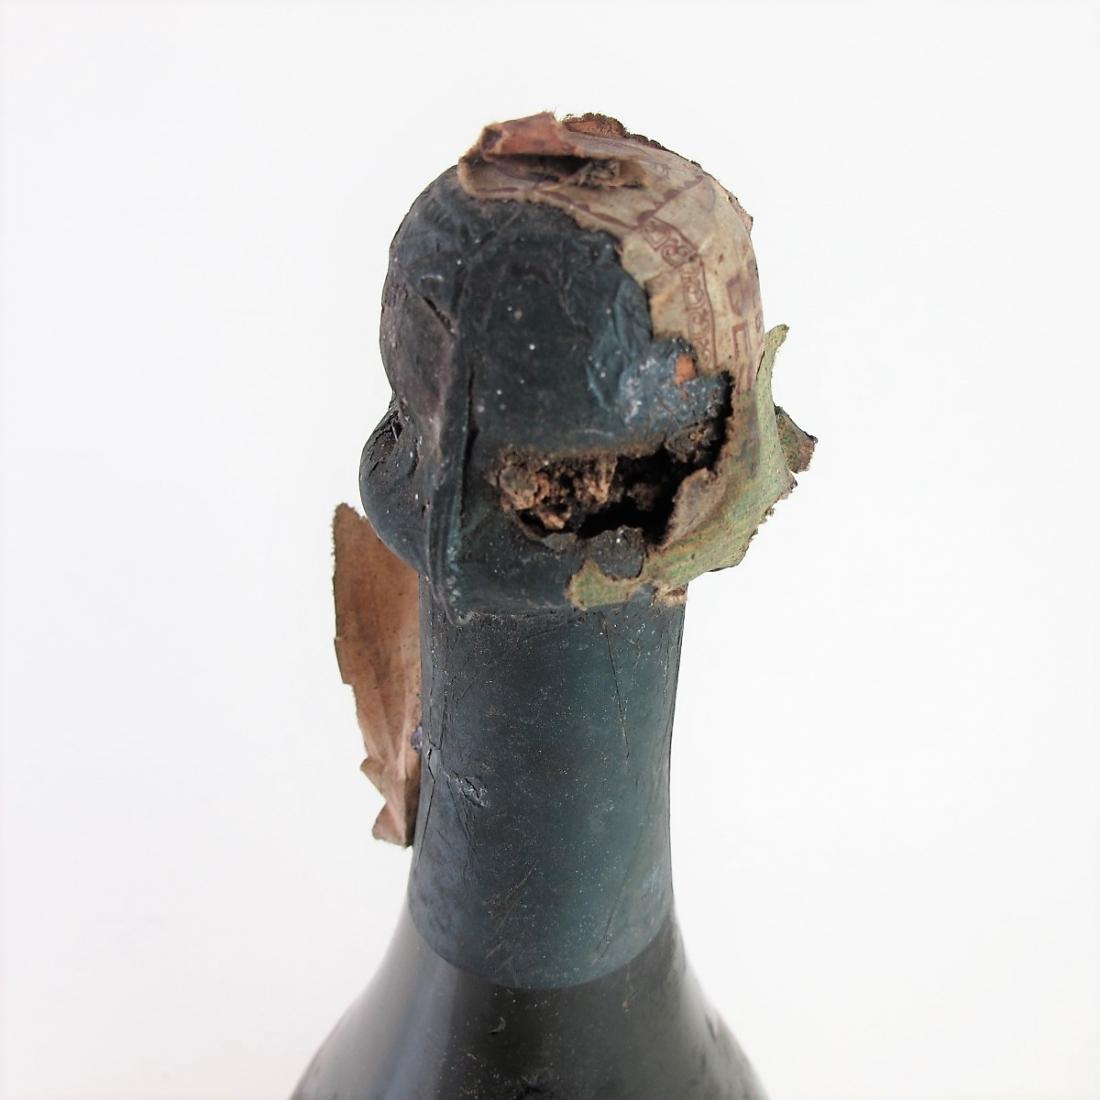 Dom Perignon Brut Vintage 1966 Champagne